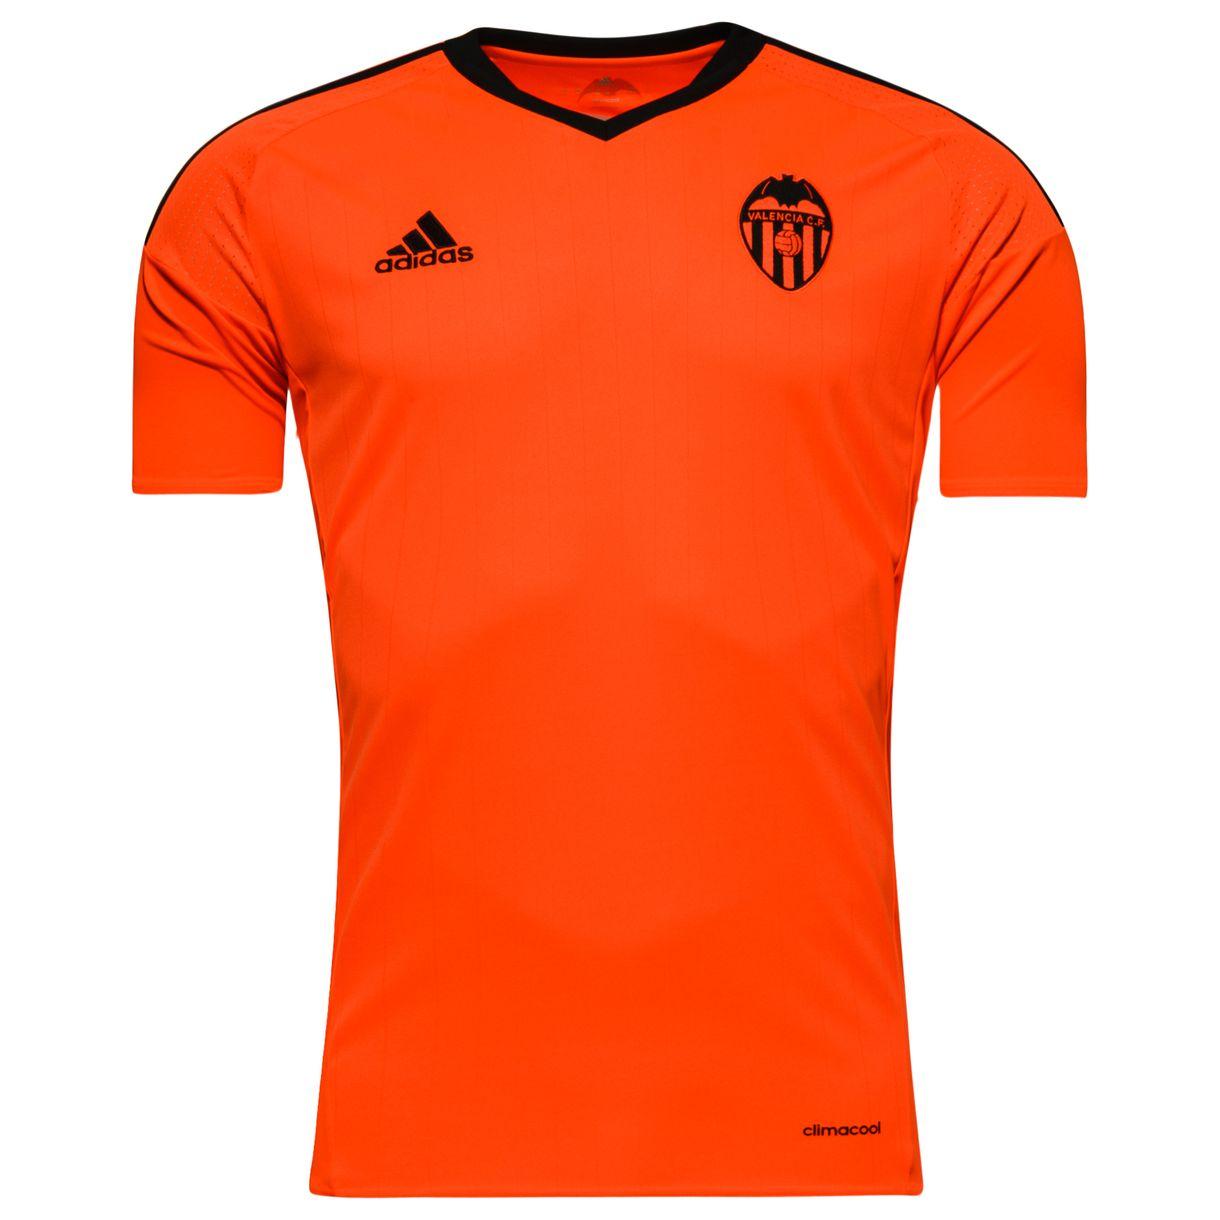 finest selection 61304 251d0 Valencia 16/17 Adidas Third Shirt | 16/17 Kits | Football ...